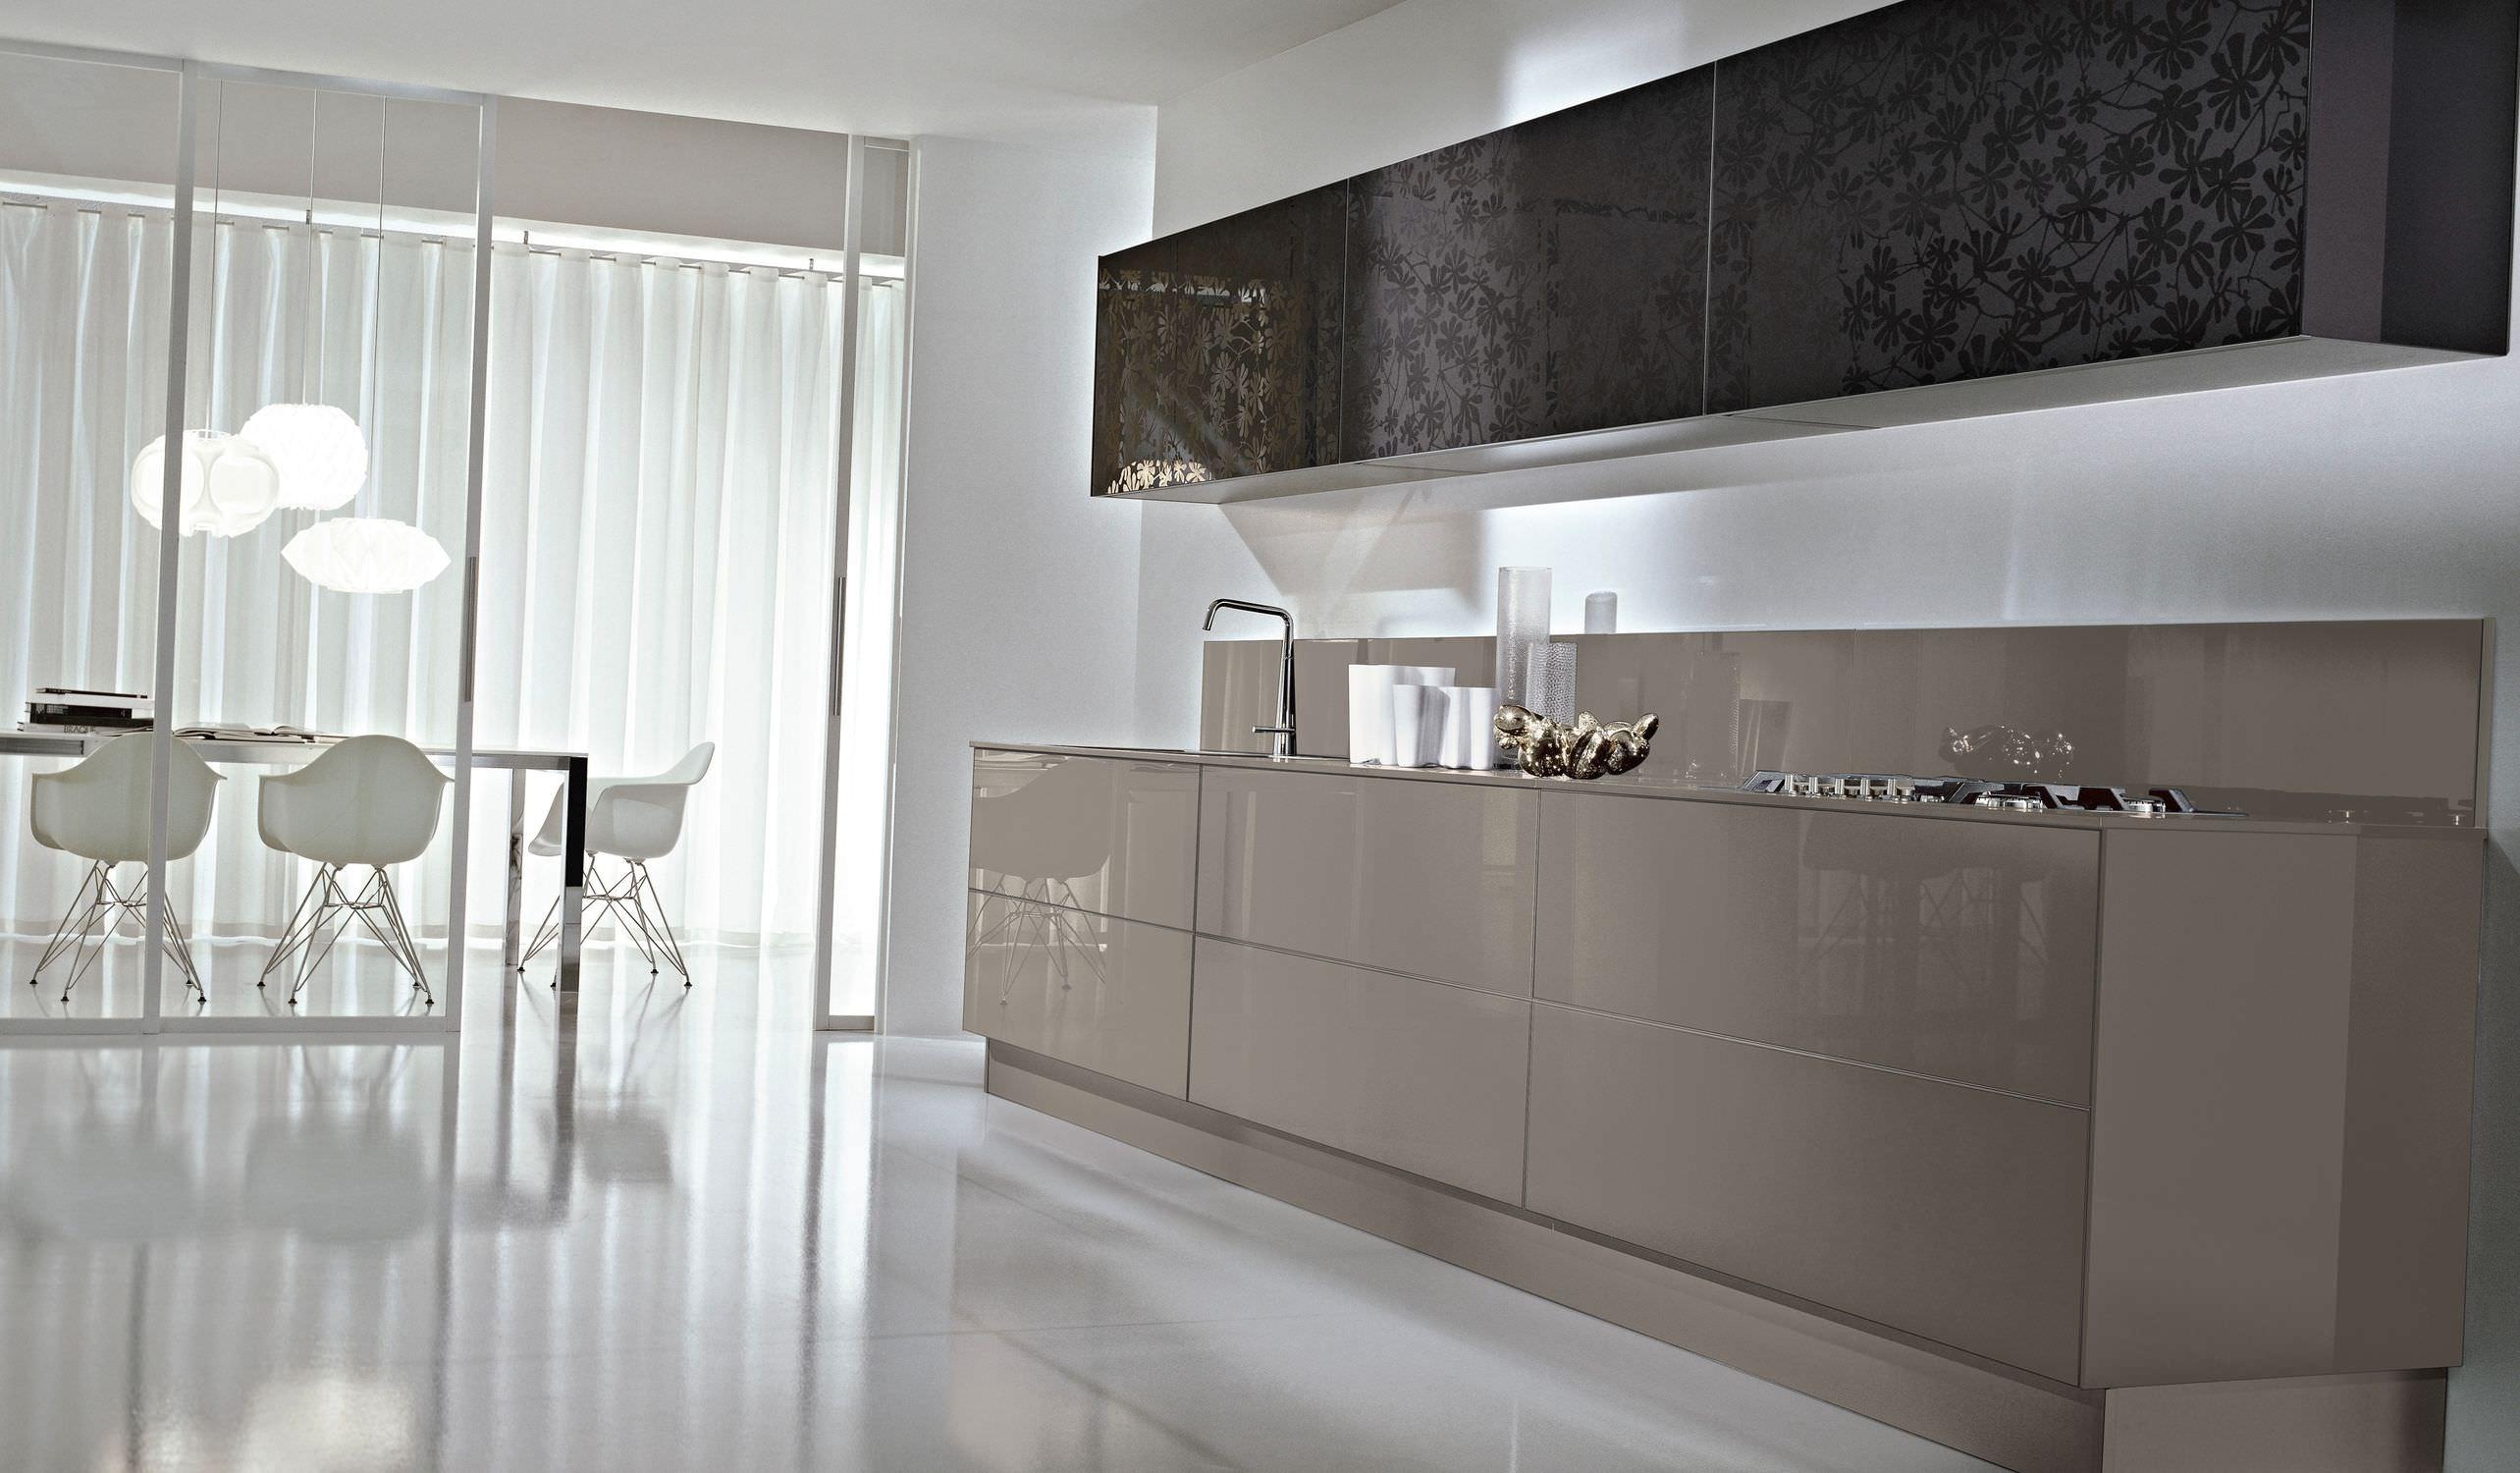 Cucina moderna / in vetro / laccata / senza maniglie - SYSTEM ...